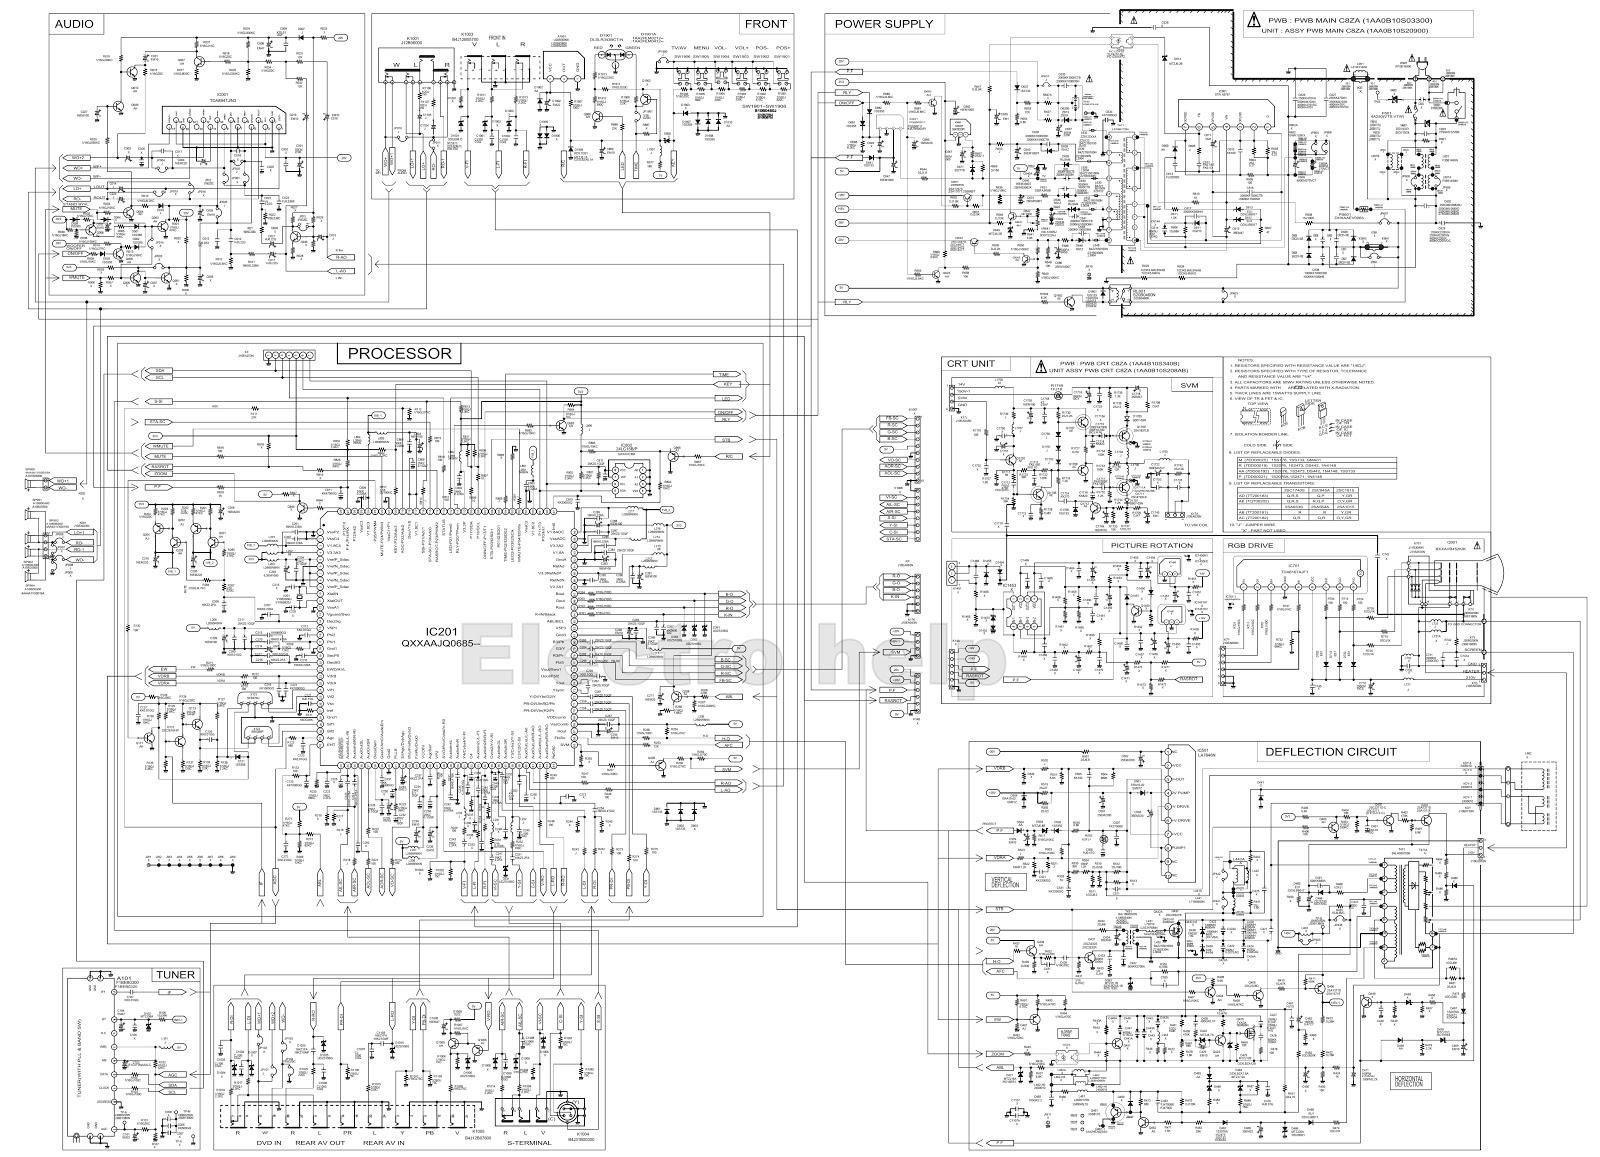 sanyo schematic diagram sanyo tv circuit diagram - wiring online schematic diagram of radio